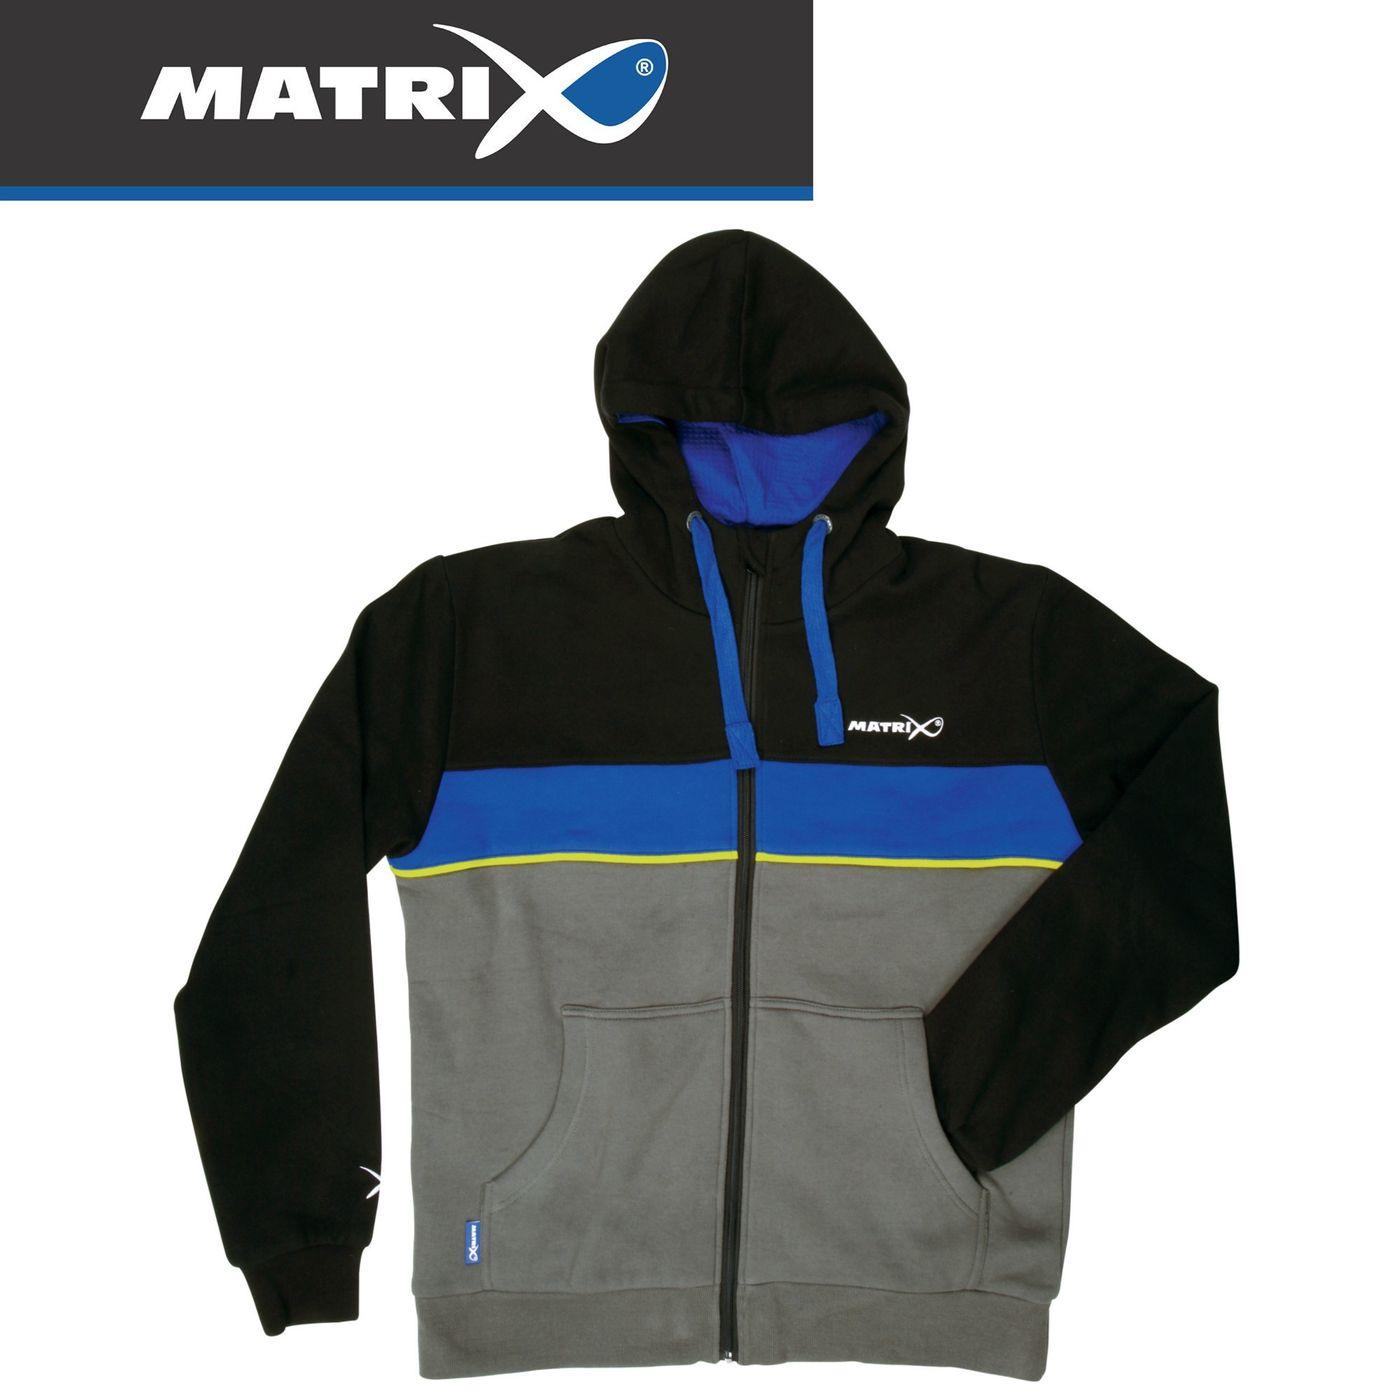 Angeljacke Fox Green Black Softshell Jacket Regenbekleidung für Angler